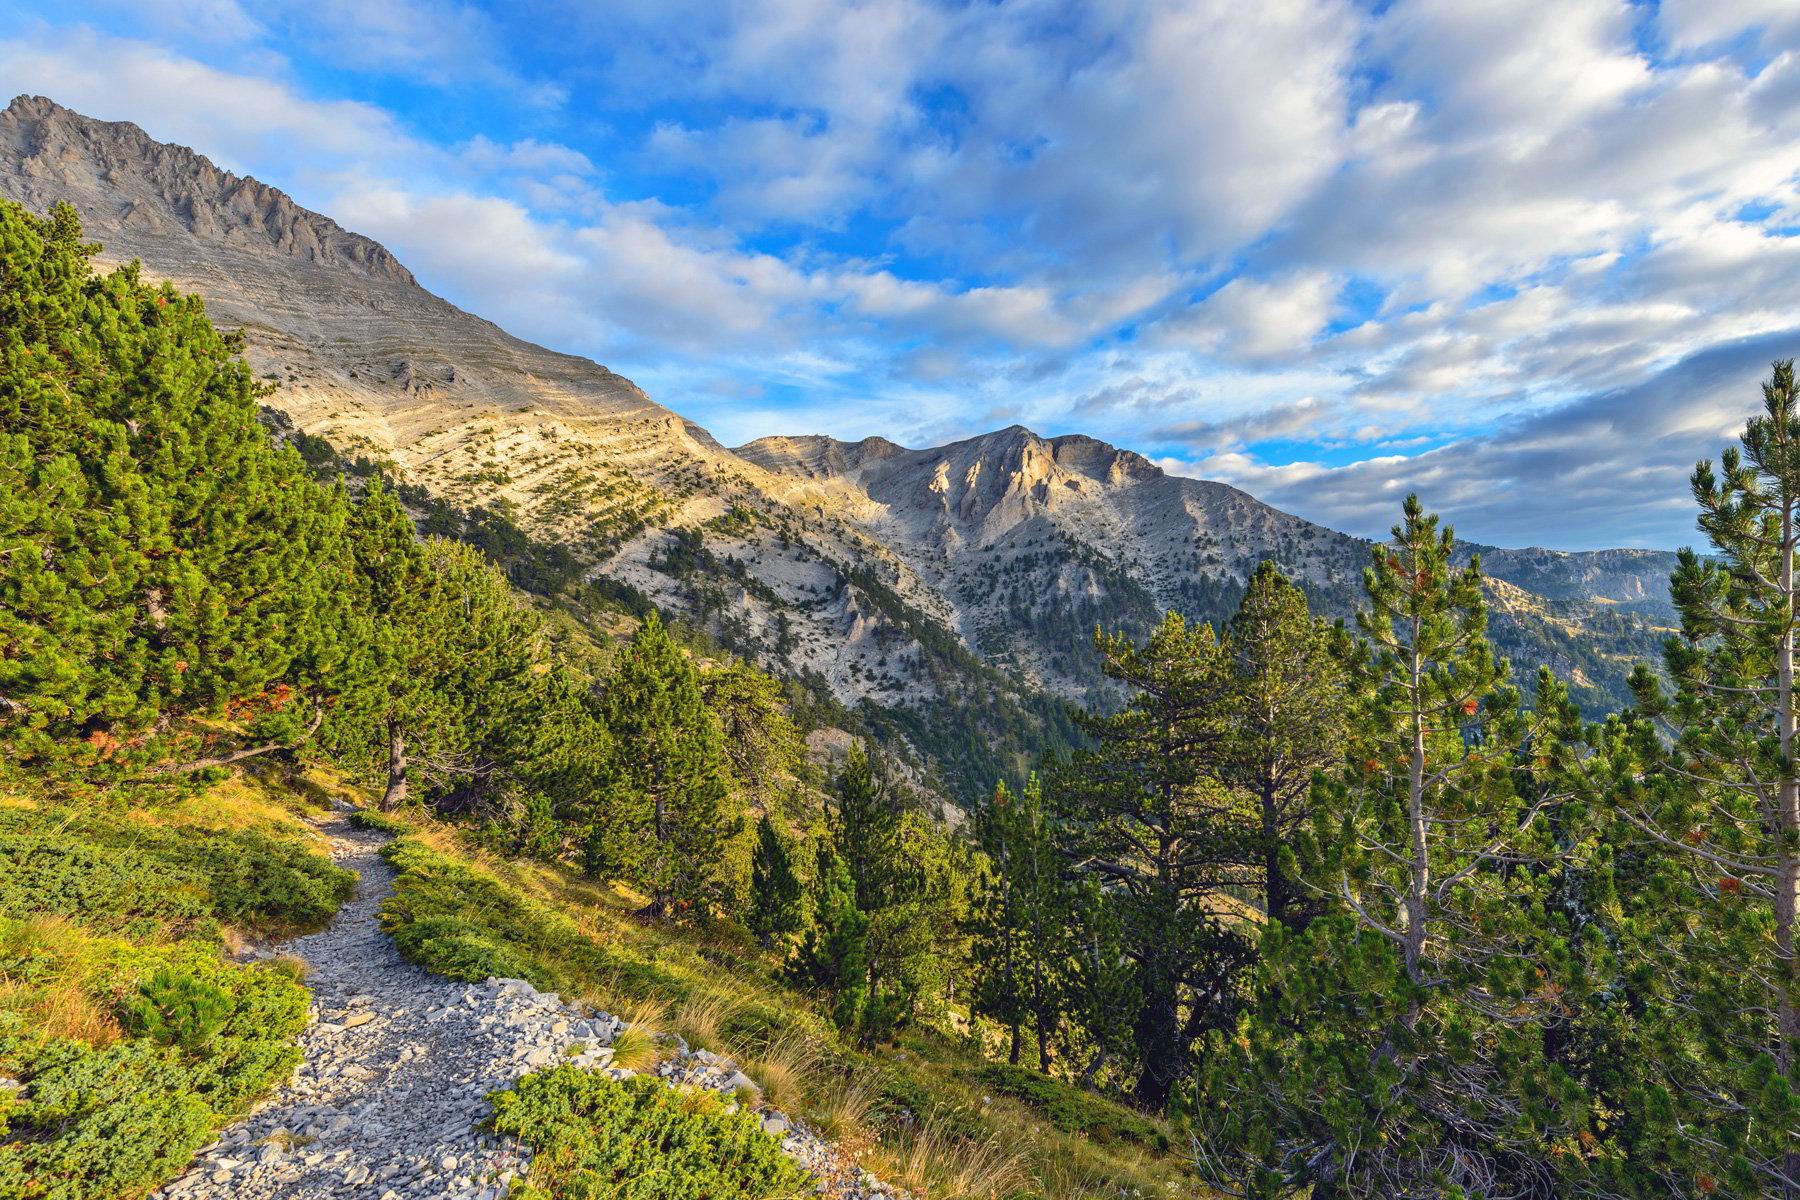 the mountain of olympus by day - Ο κατάλληλος προορισμός, δίπλα στην Λάρισα, για εκδρομή την άνοιξη!